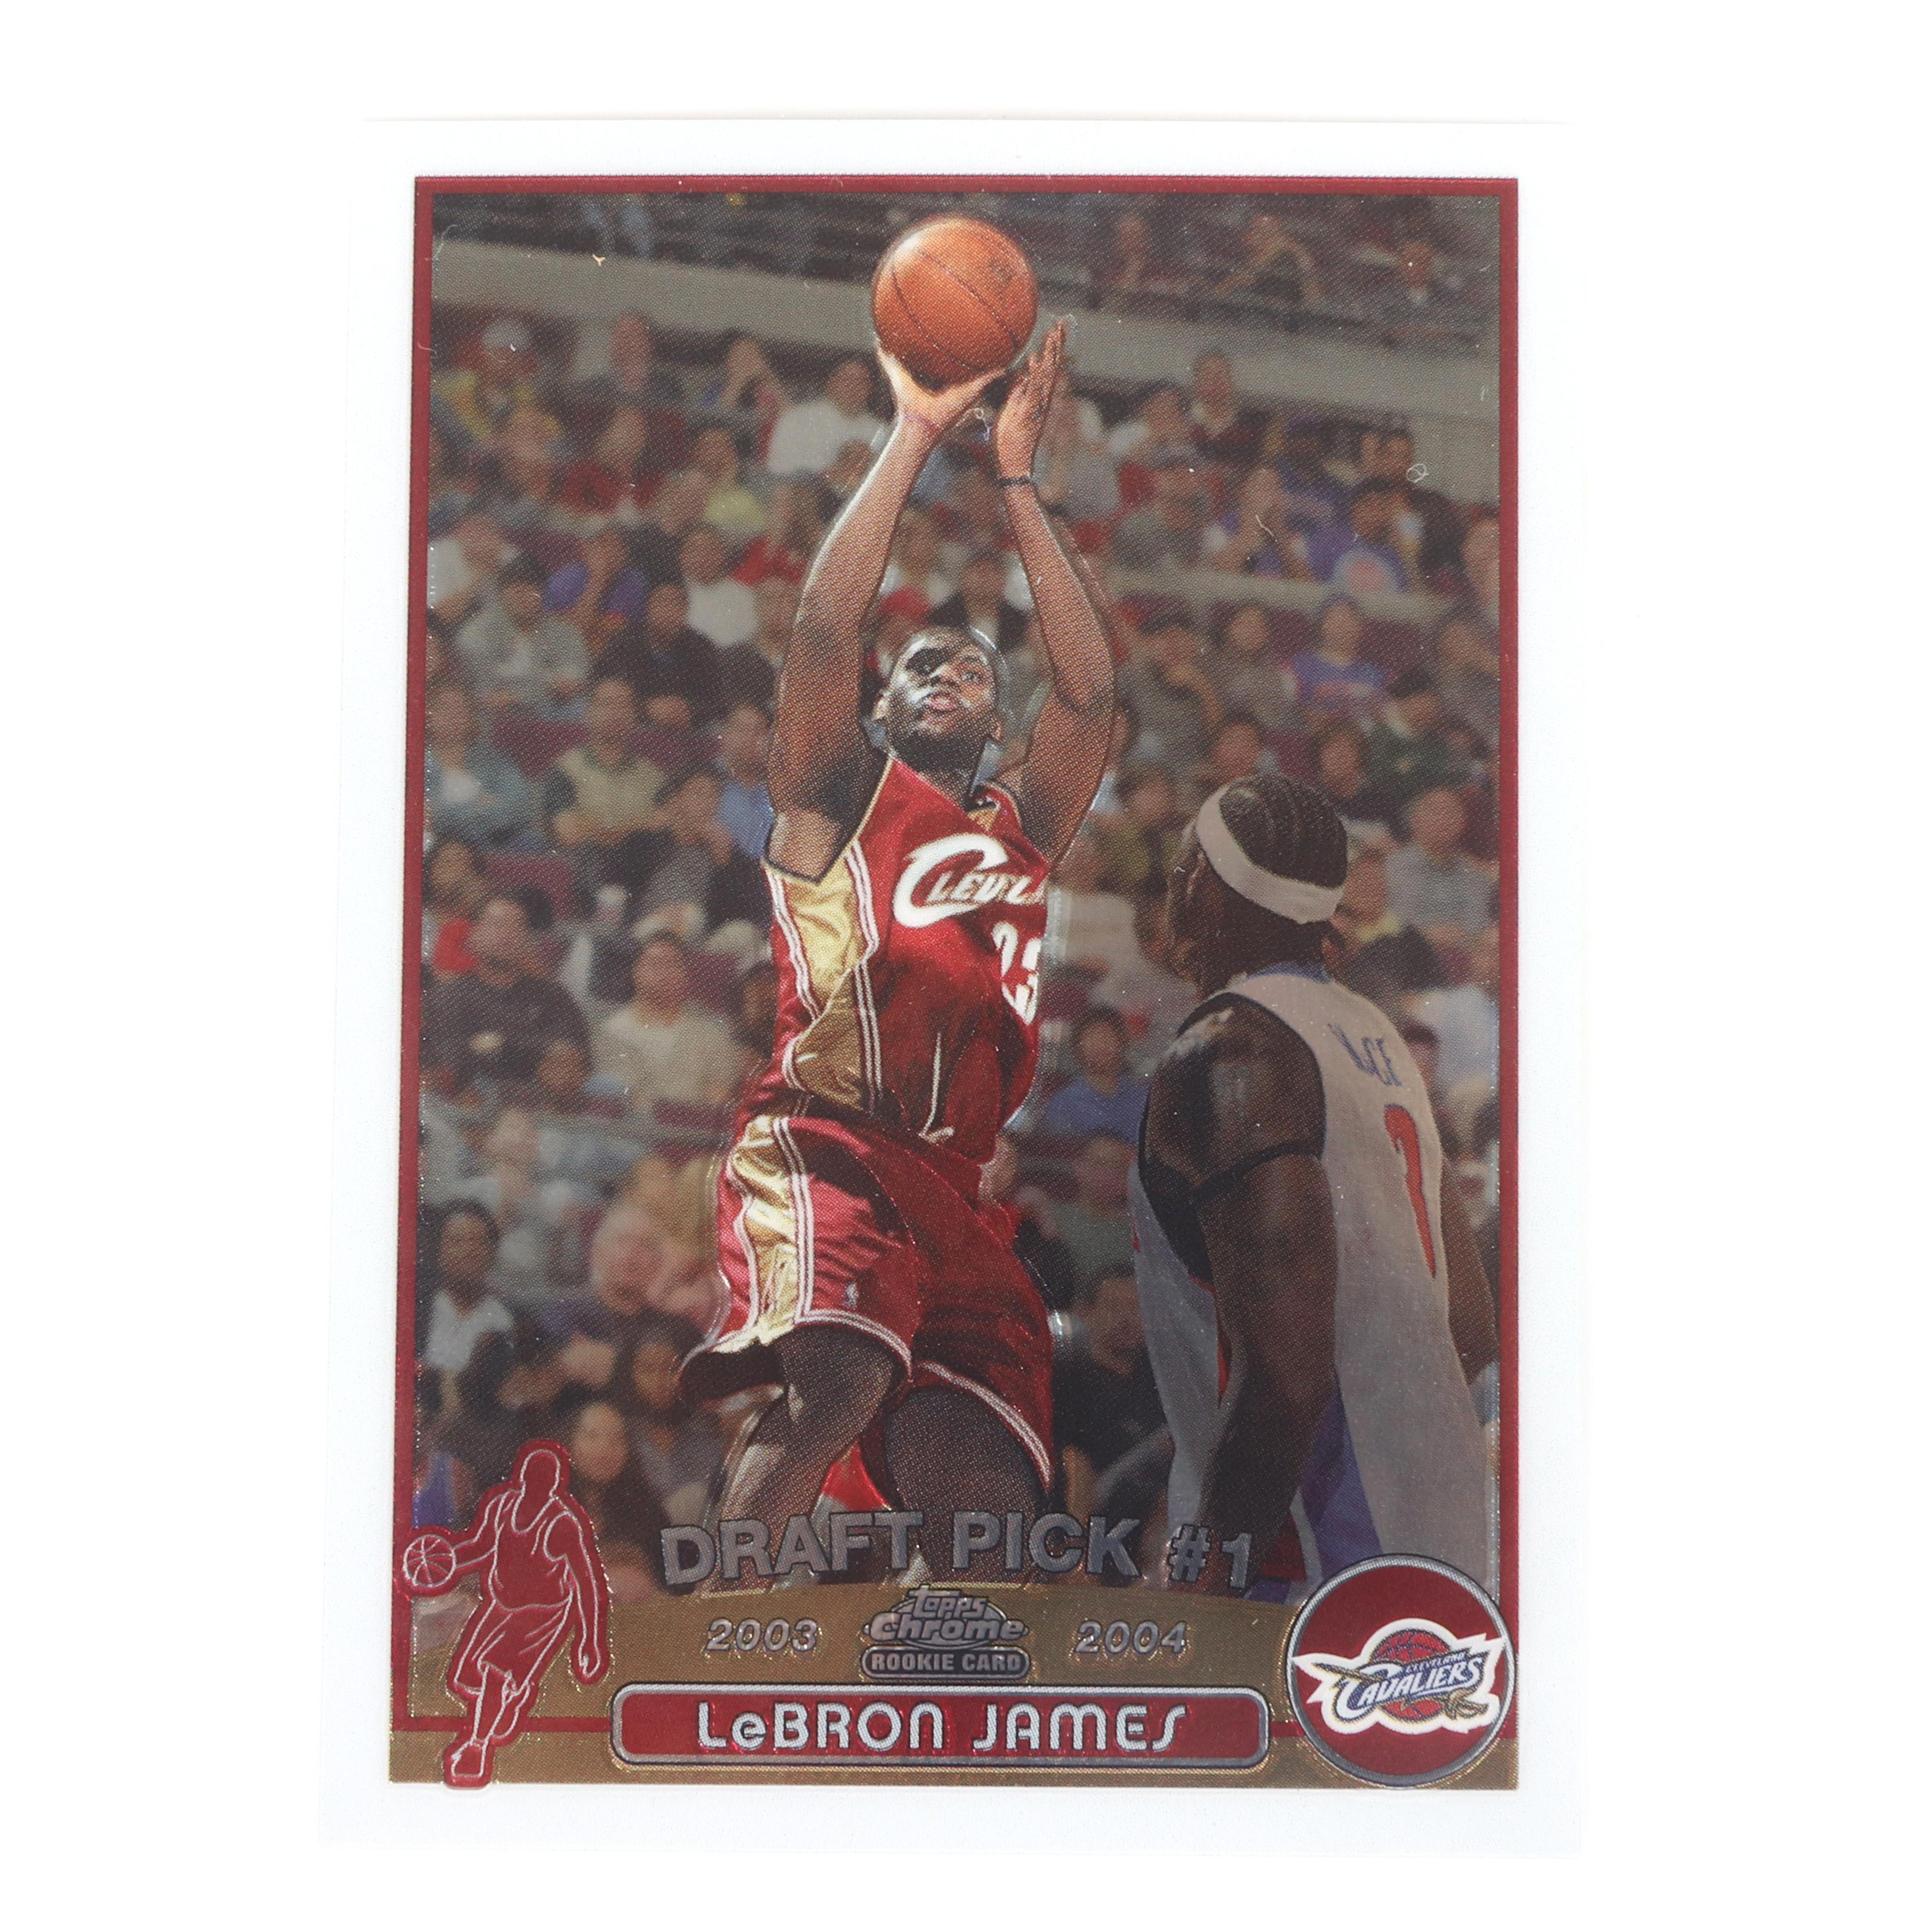 2003-04 Topps Chrome Lebron James Rookie Card #111